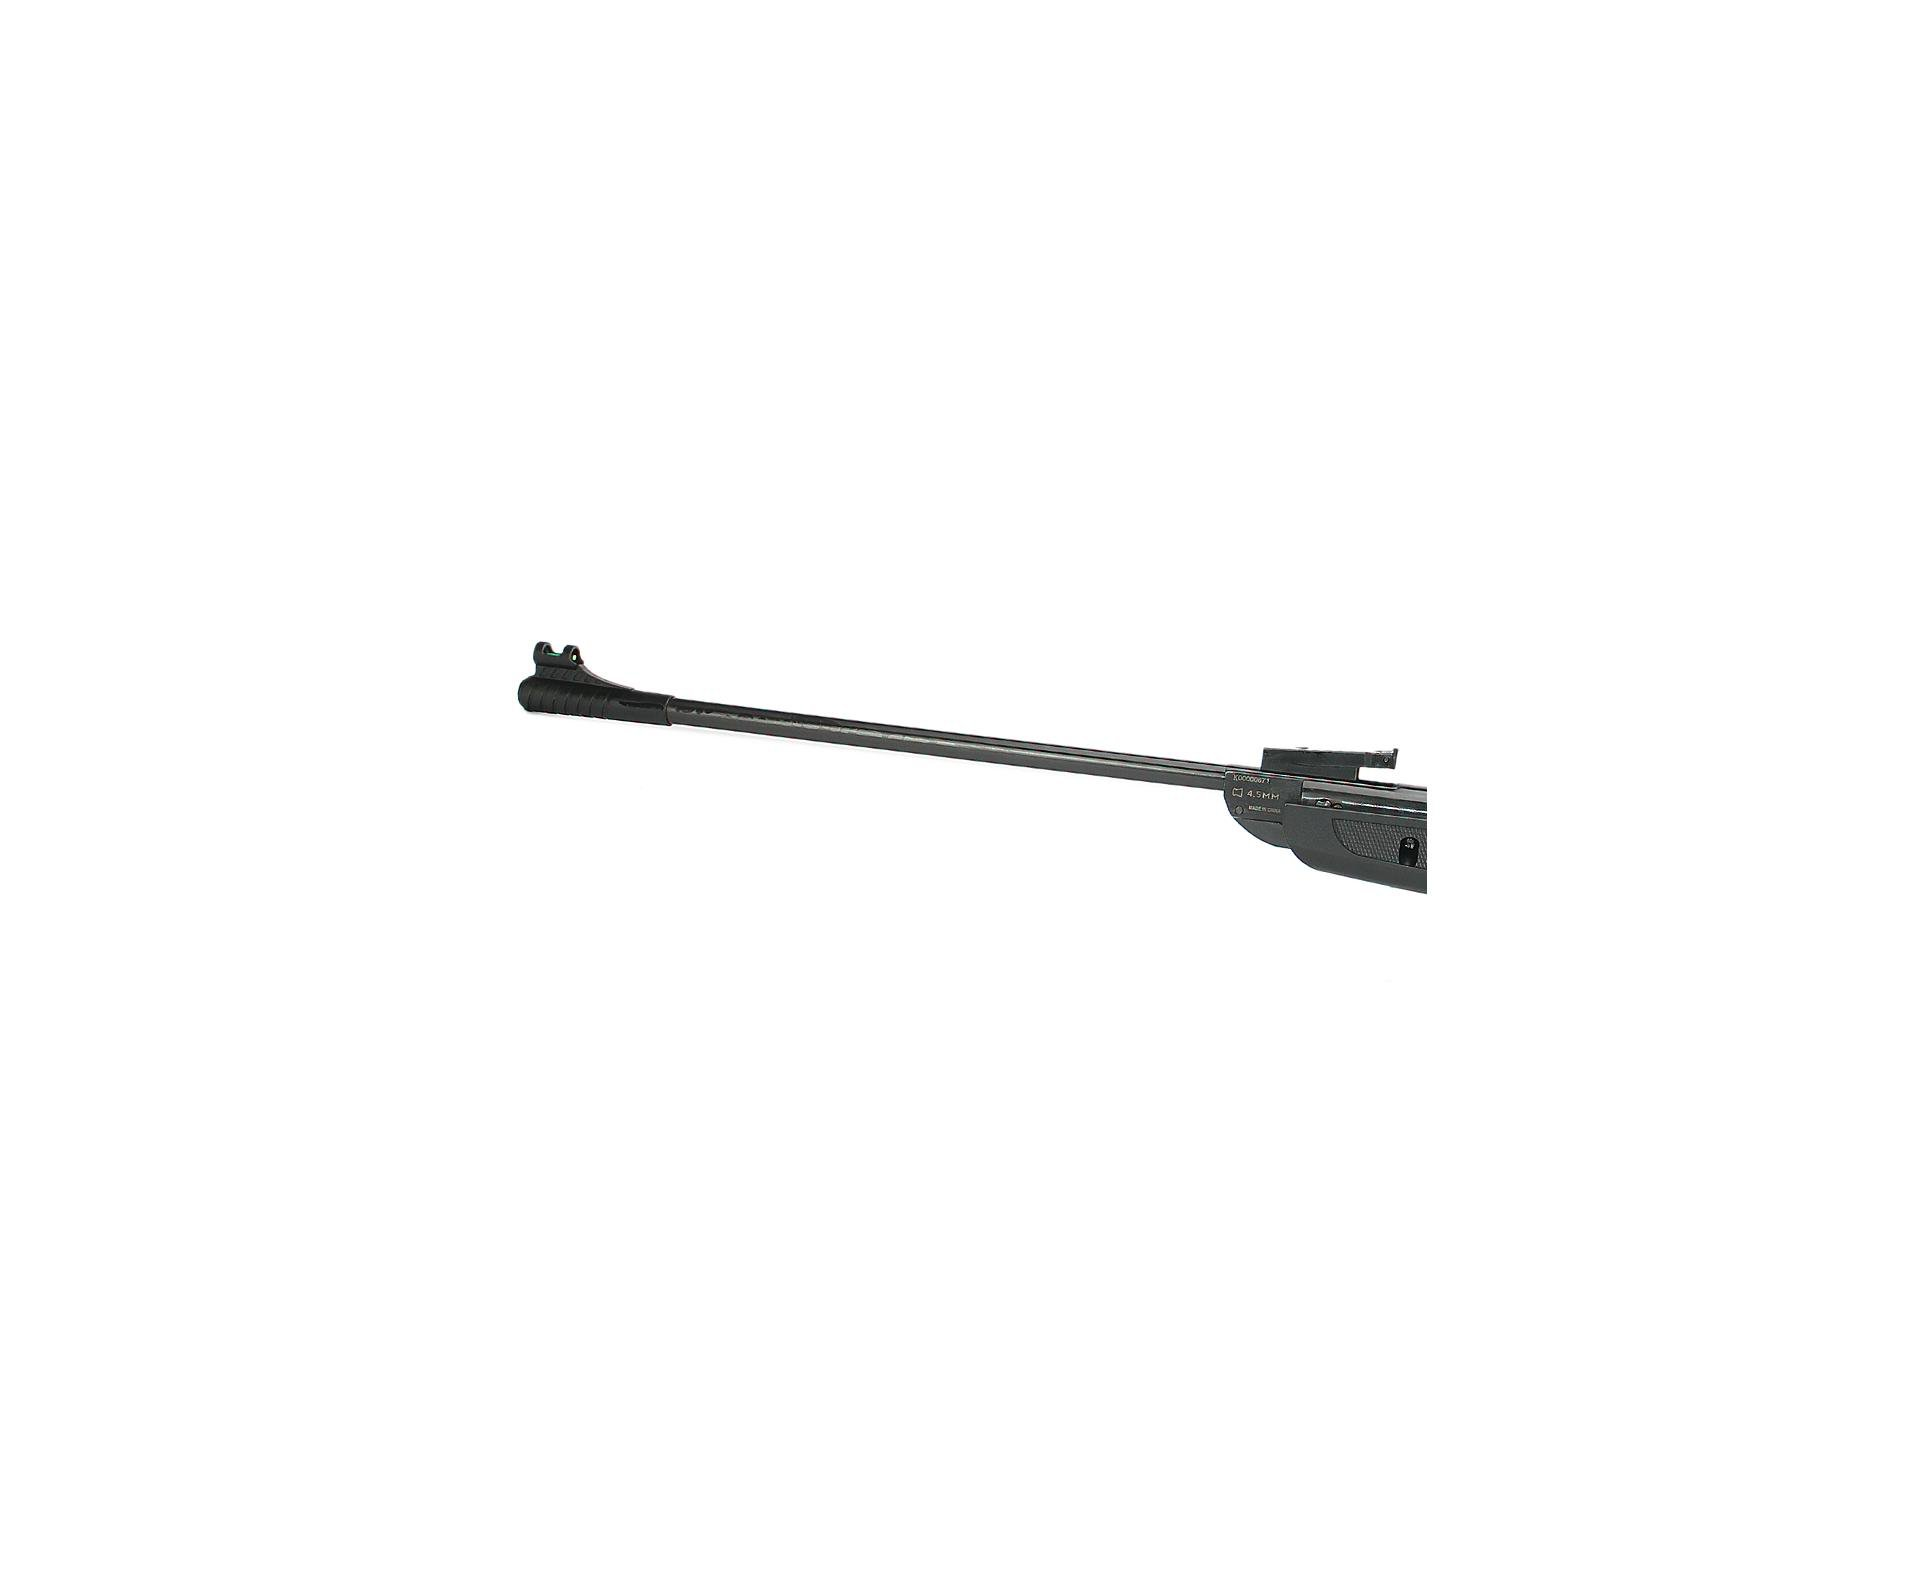 Carabina De Pressão Rossi Dione New Black Sport Polímero 4,5mm